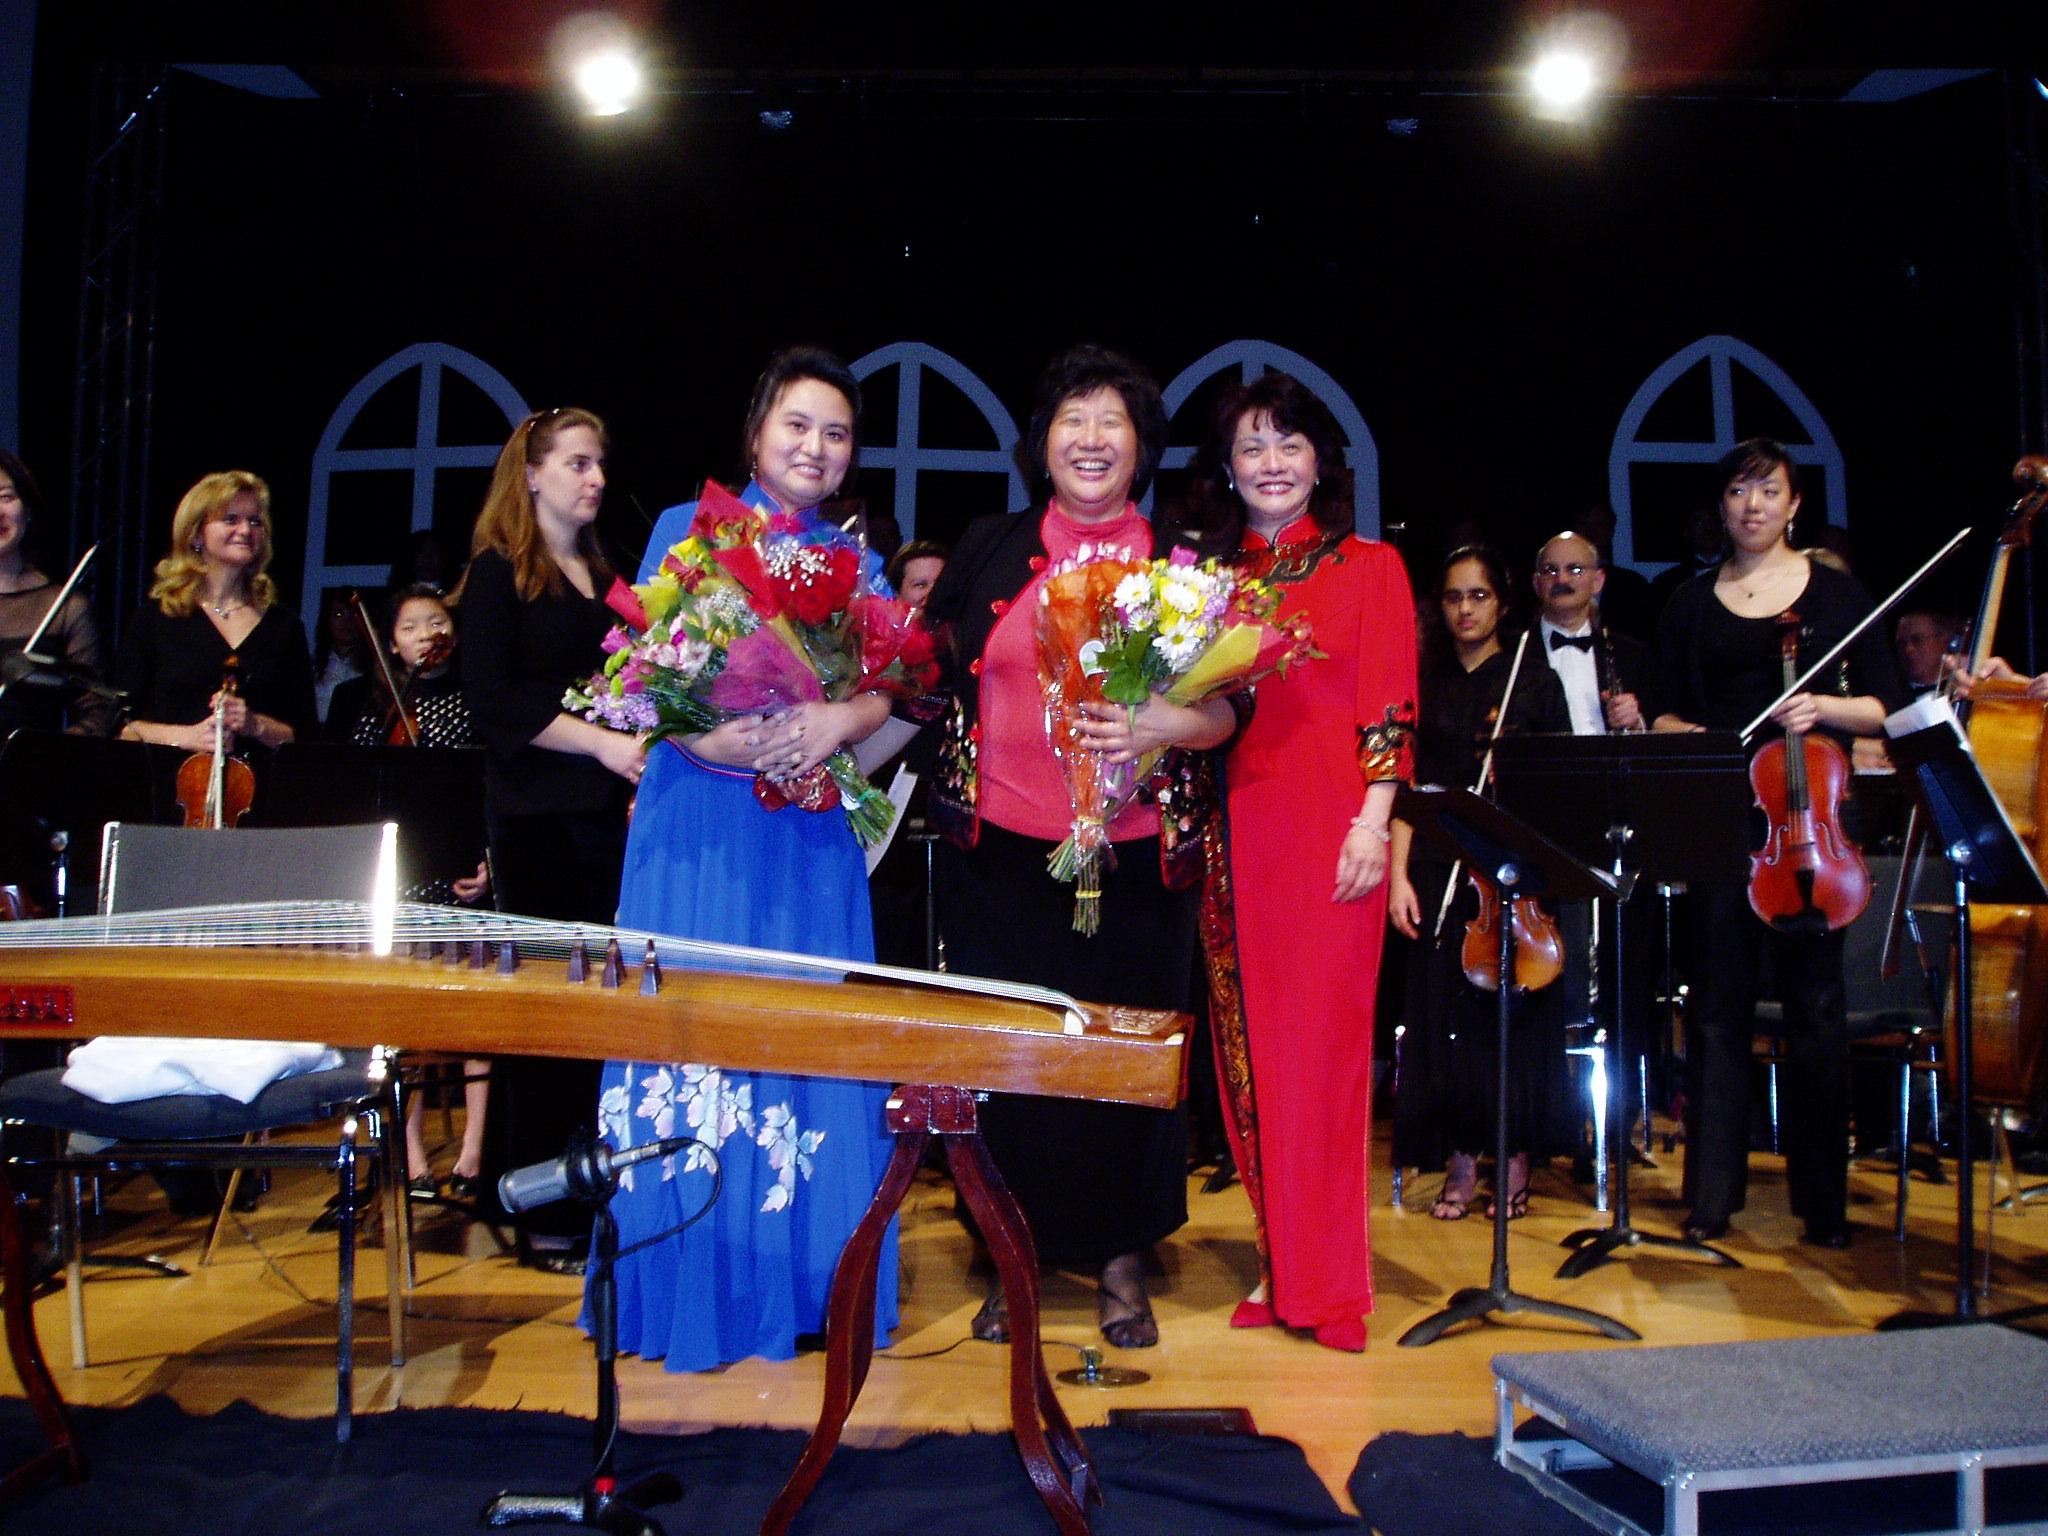 Jubilent performers concluding amagnificent concert!